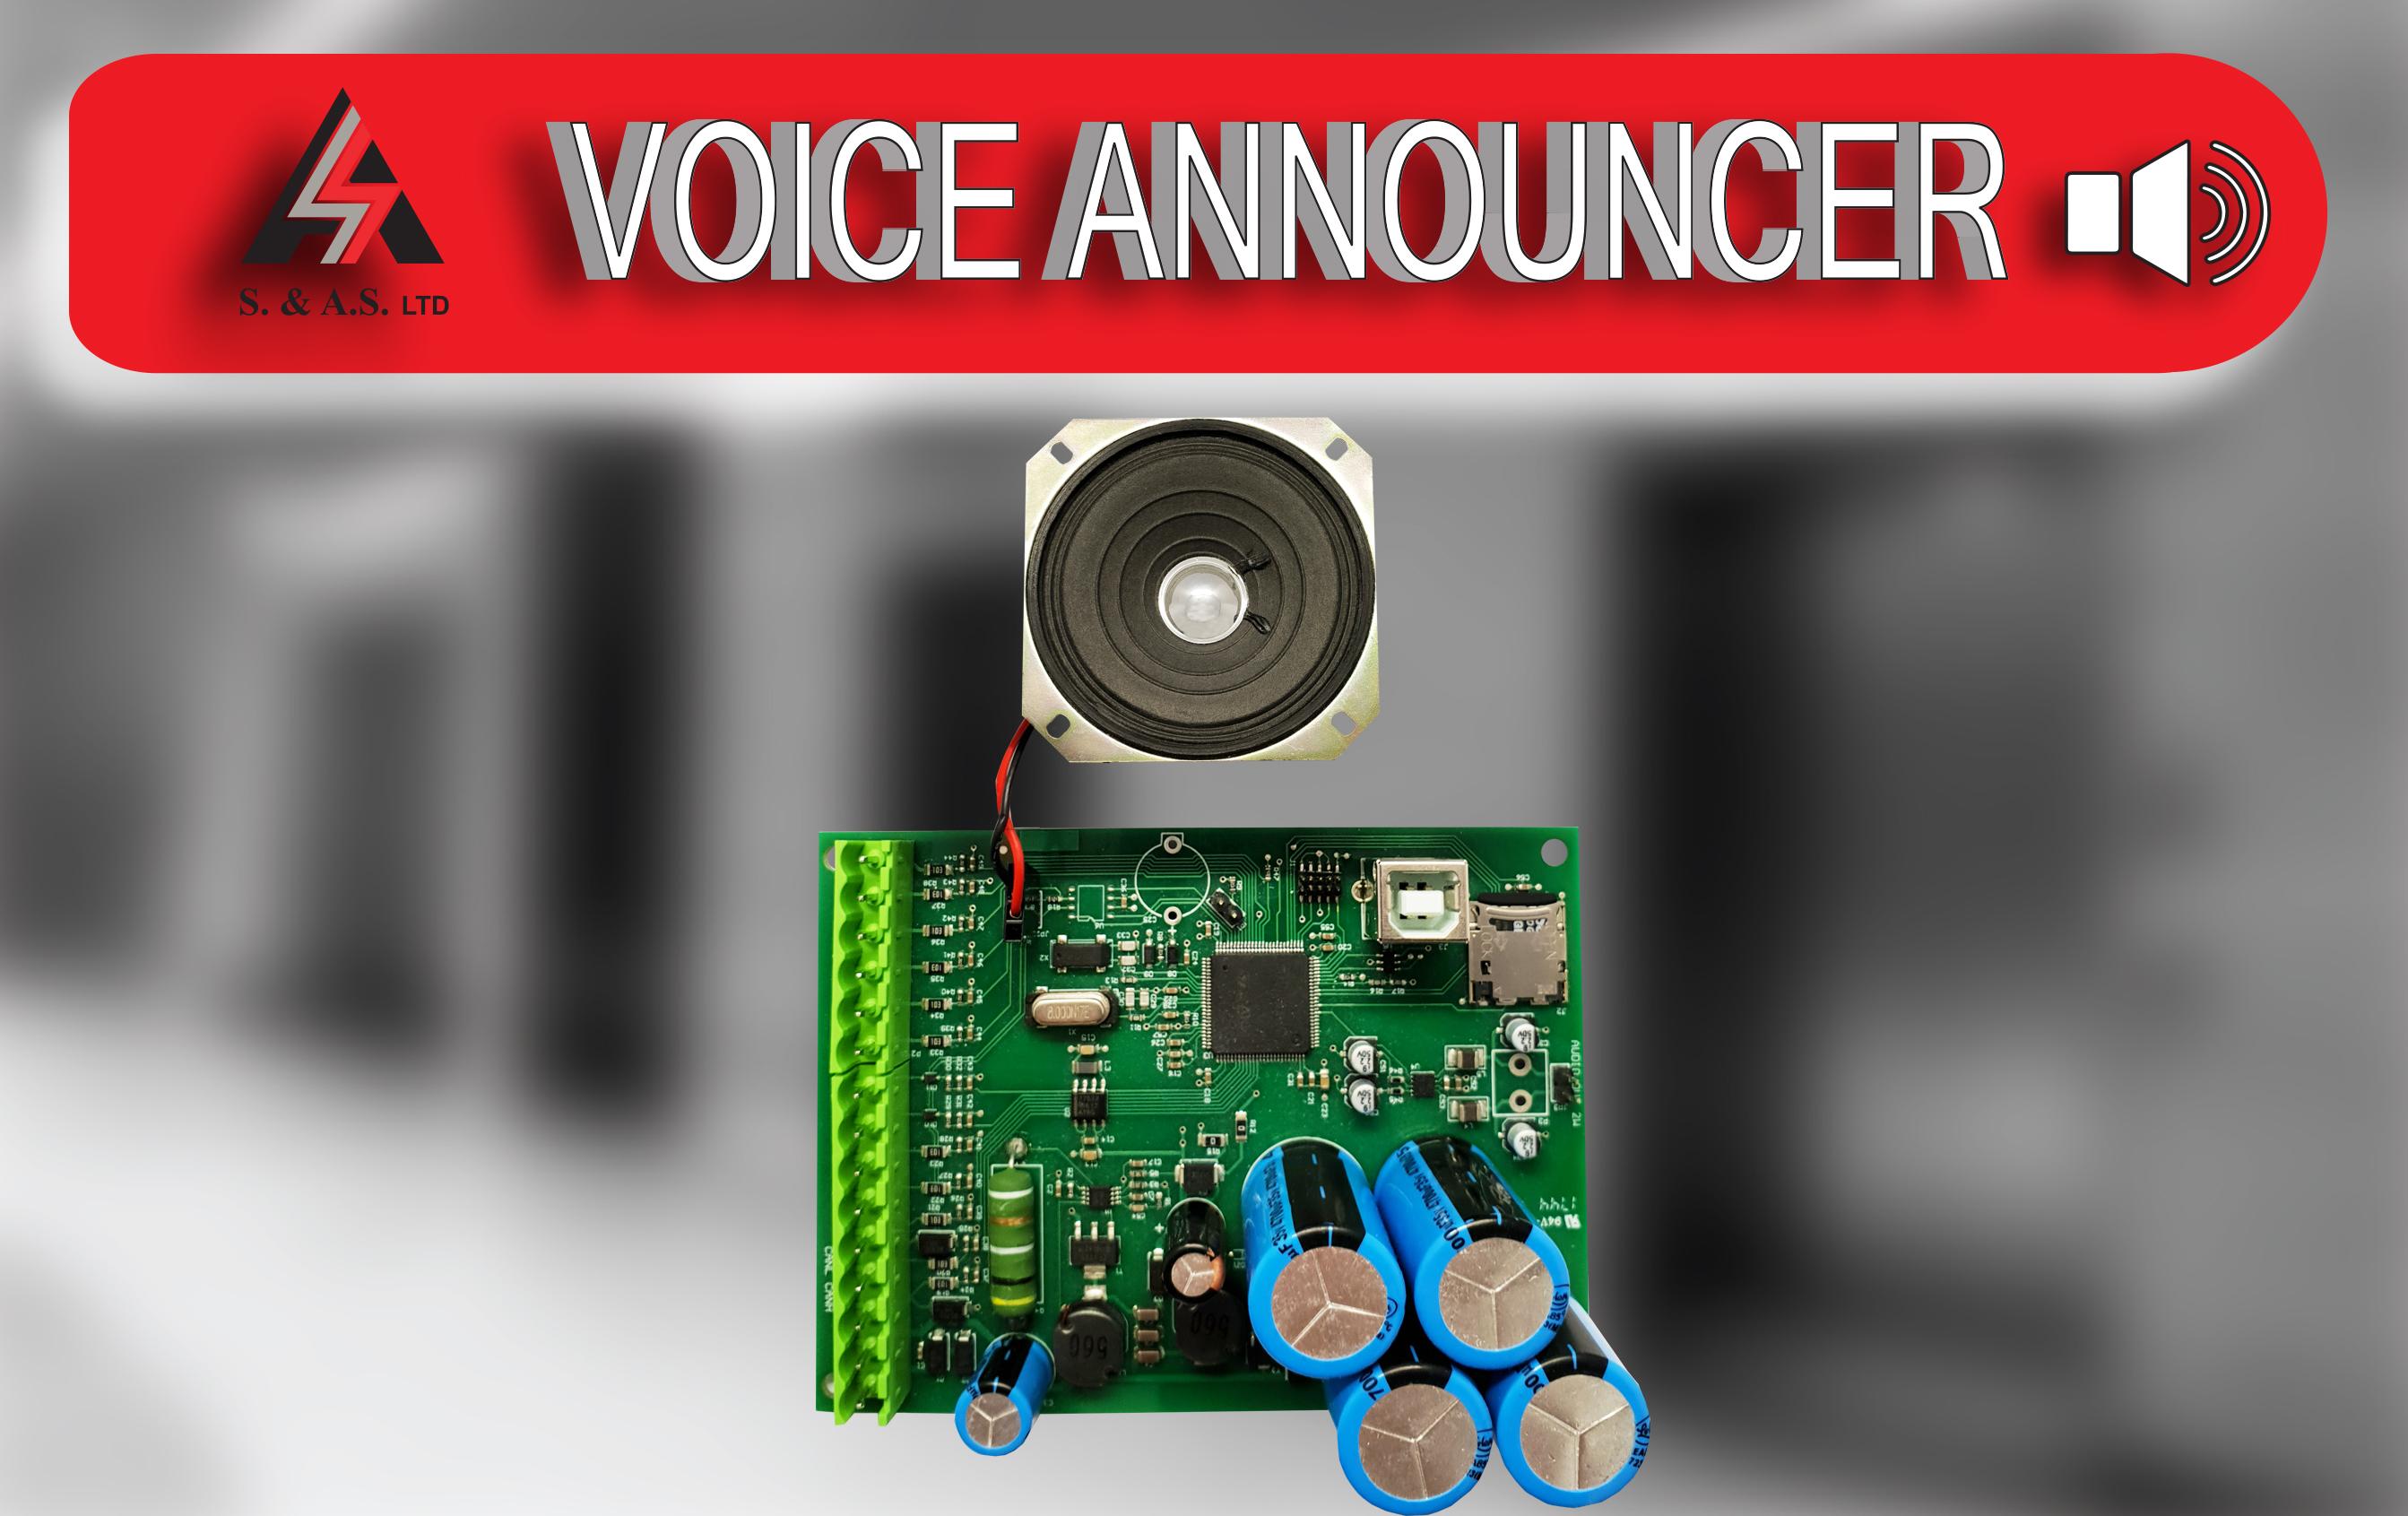 VOICE ANNOUNCER